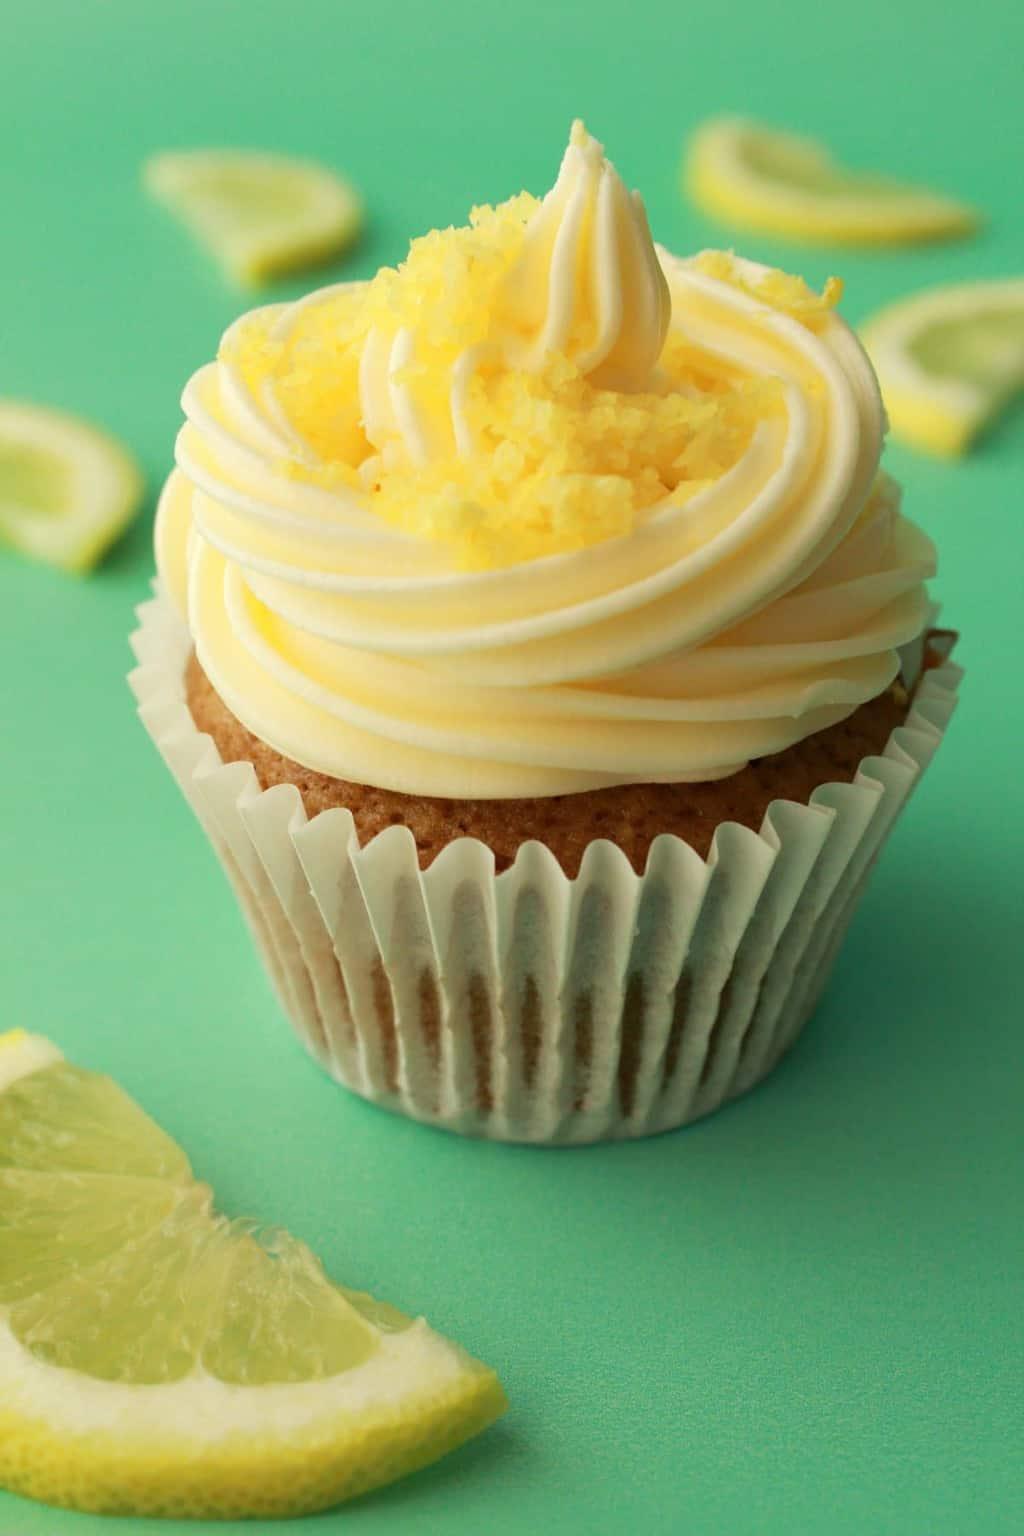 Vegan lemon cupcake topped with lemon frosting and lemon zest